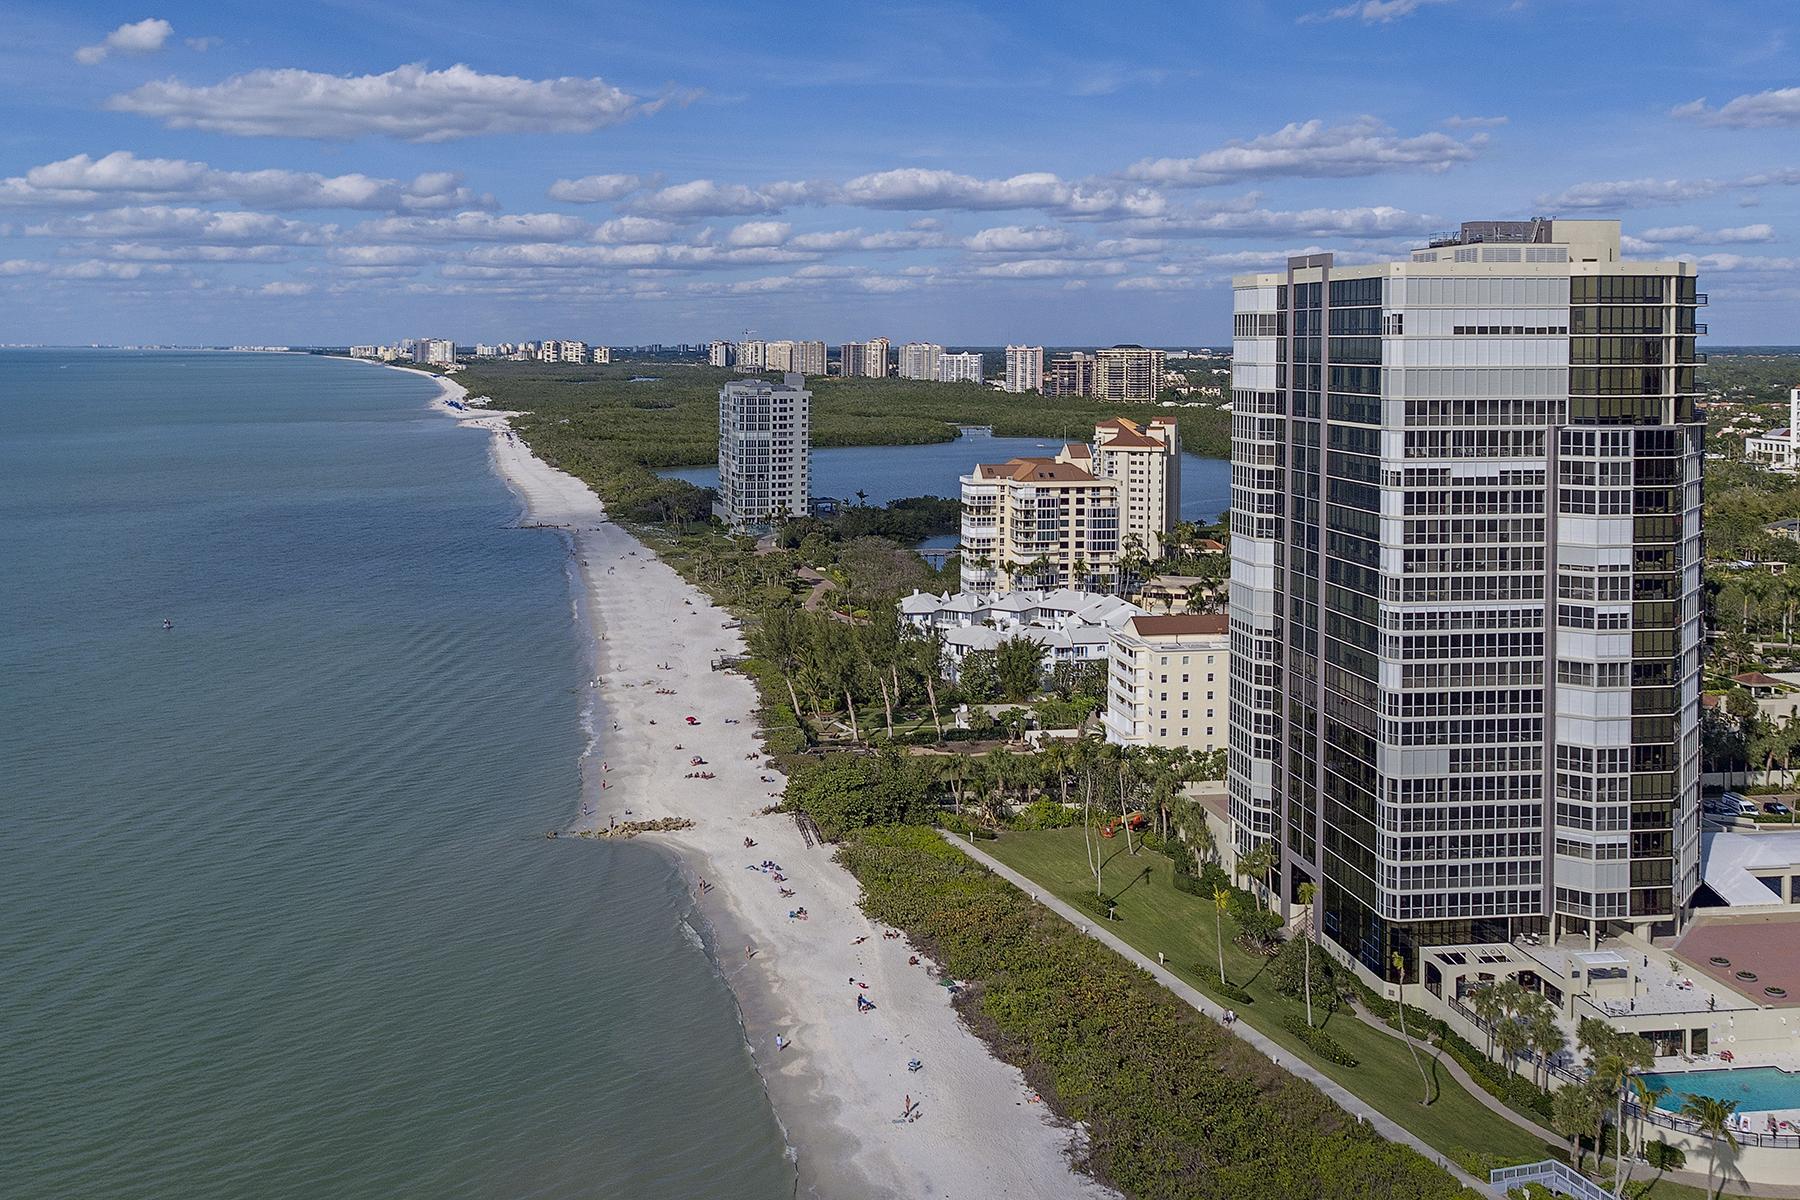 Condominium for Sale at PARK SHORE - LE PARC 4951 Gulf Shore Blvd N 603, Naples, Florida, 34103 United States